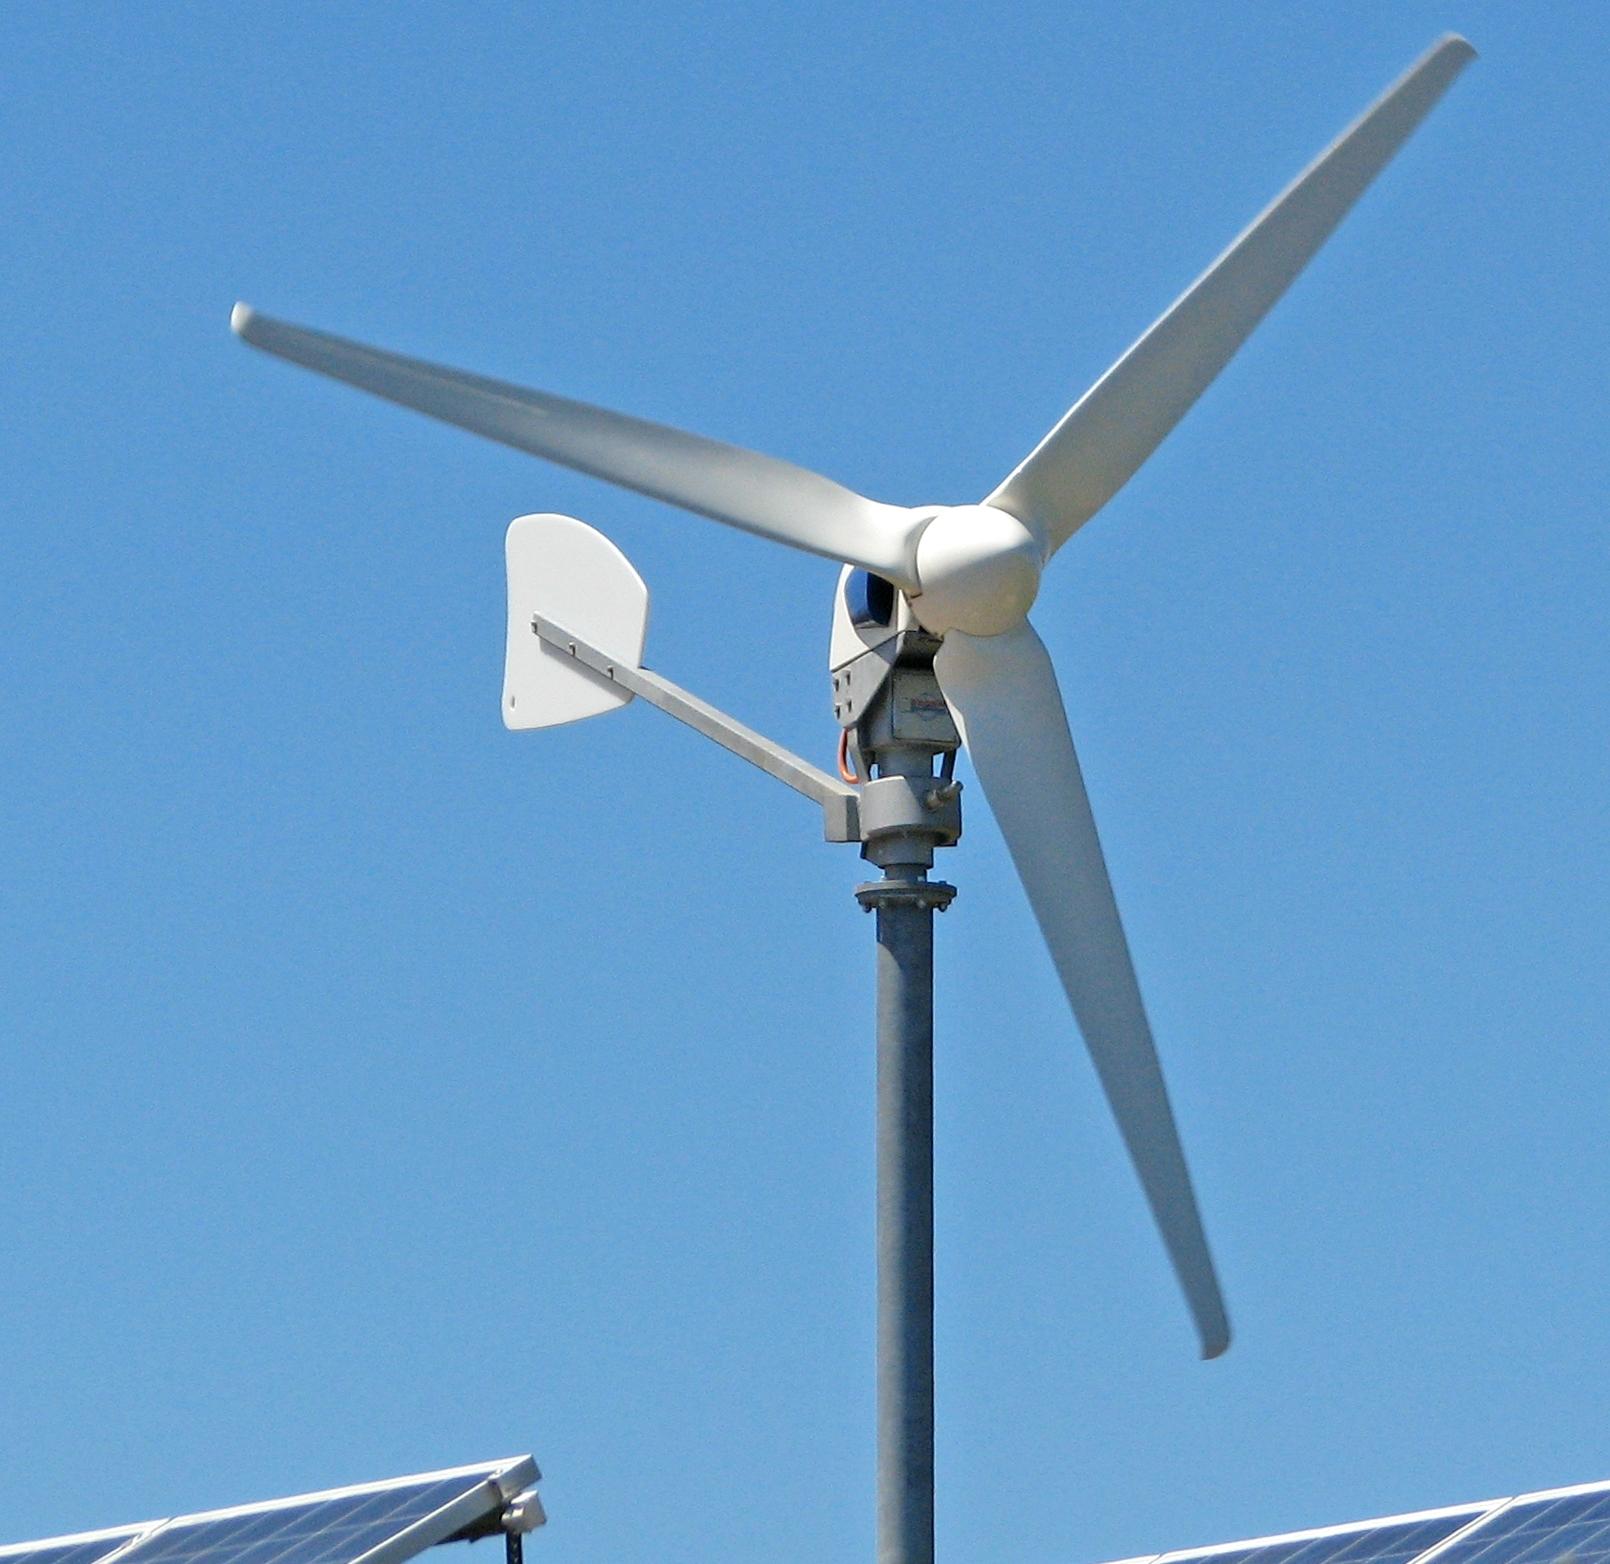 ANTARIS 3.5 kW   BRAUN Windturbinen GmbH   Small Windturbines